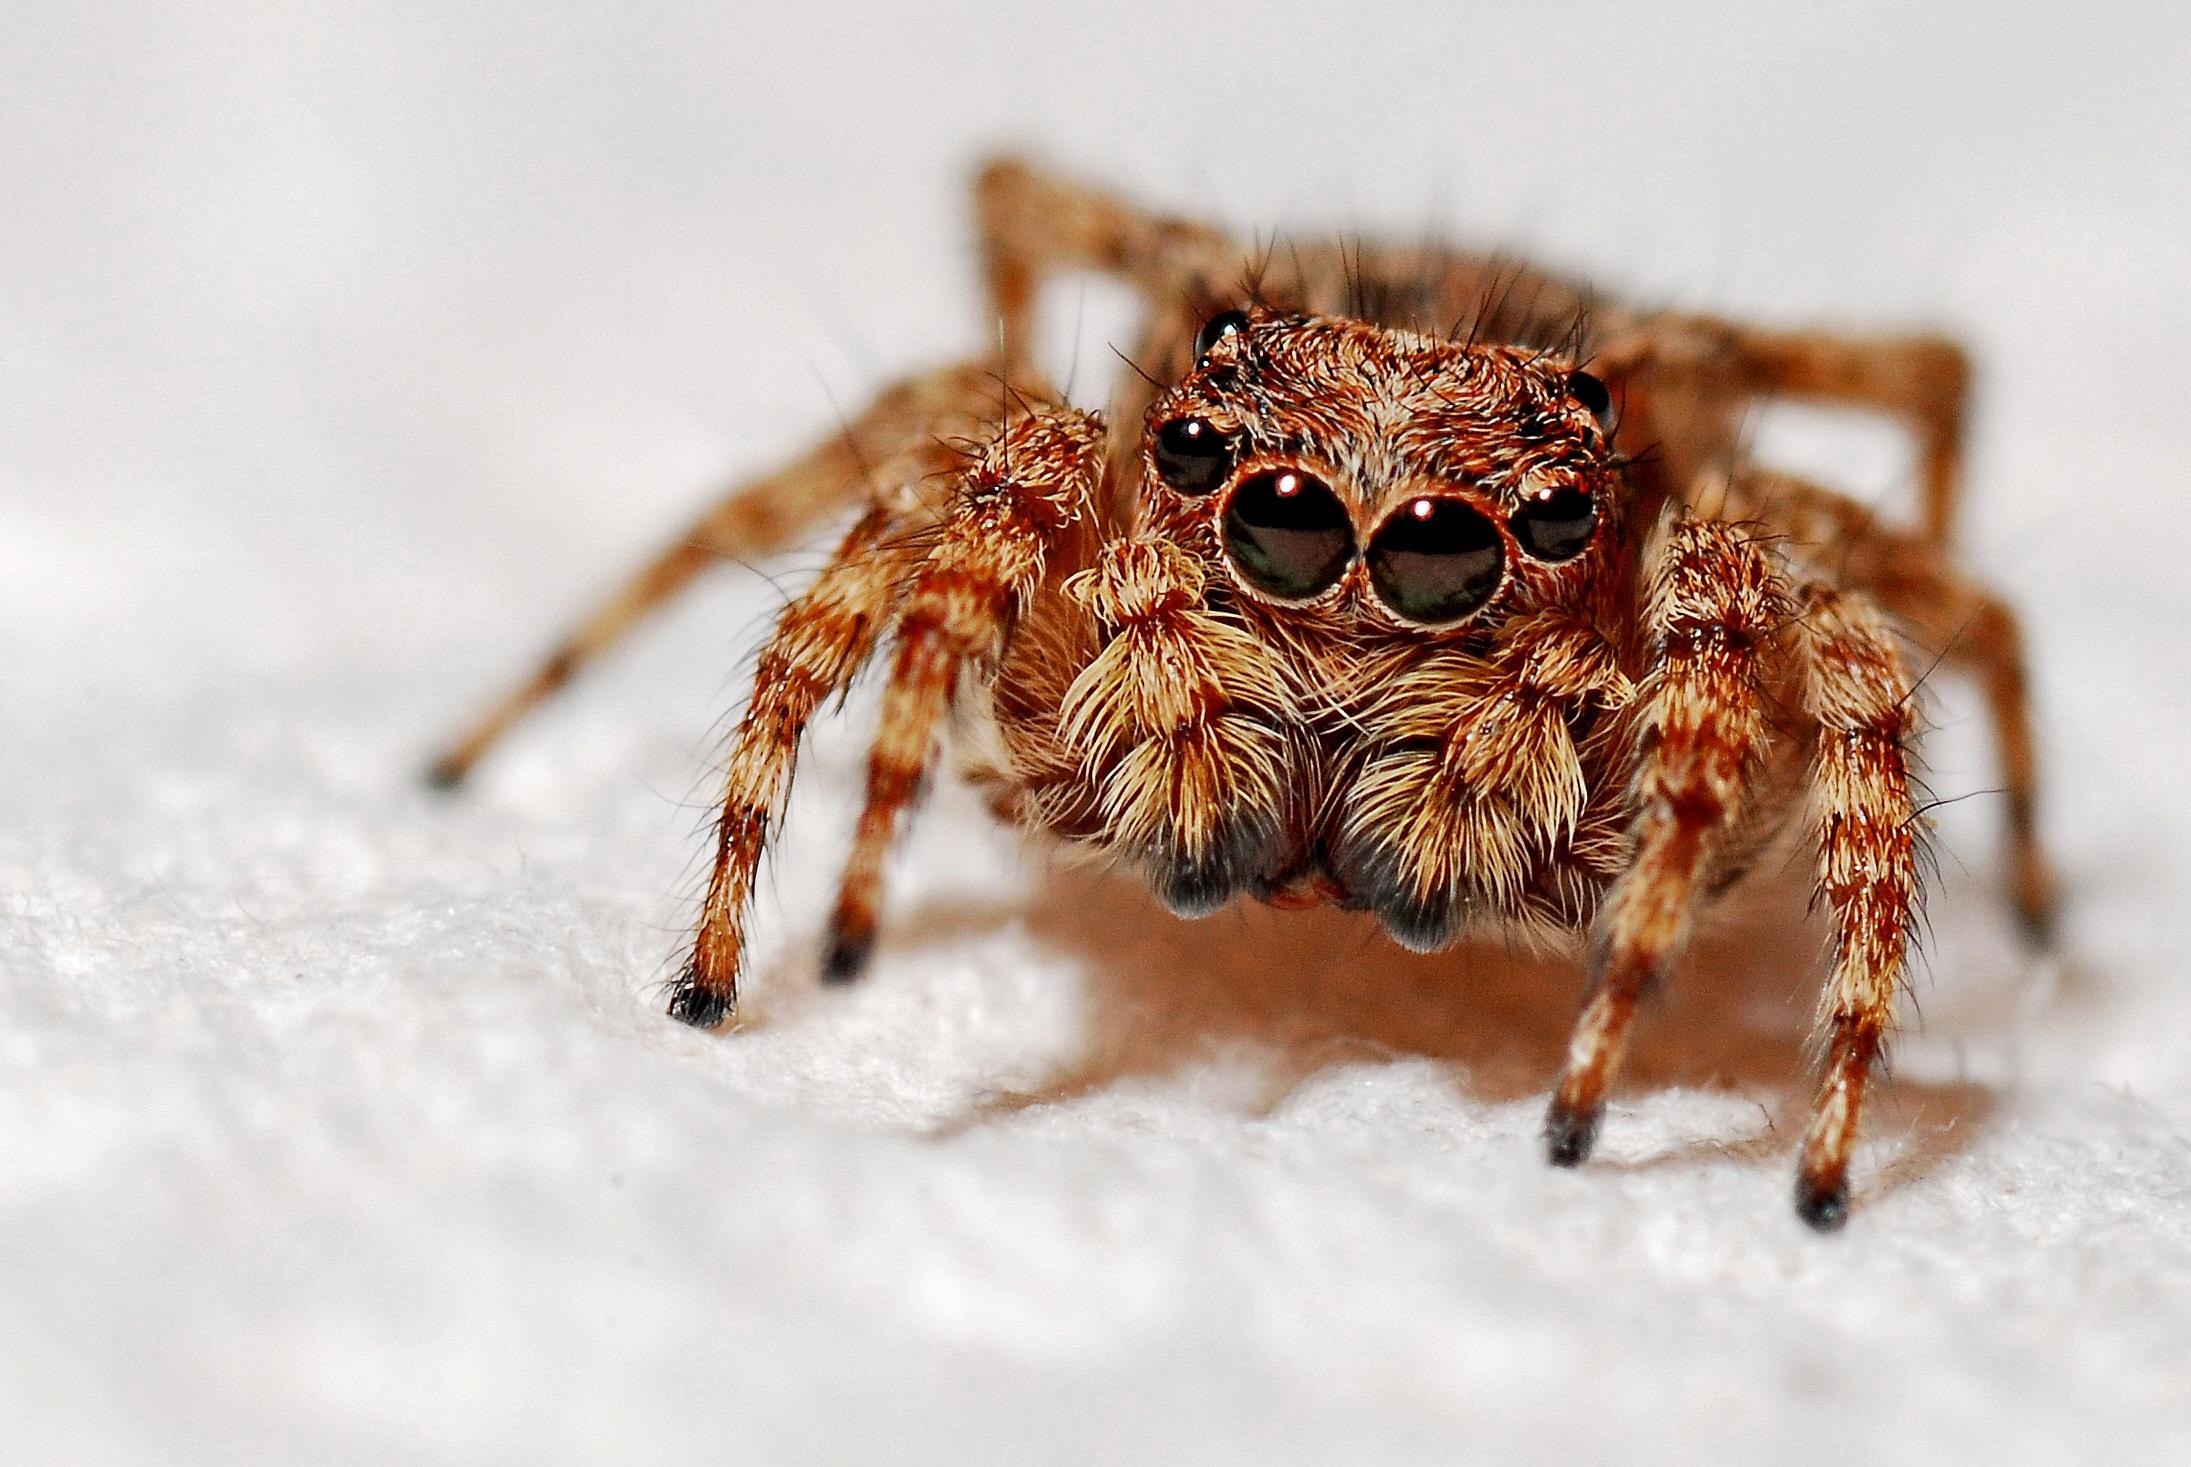 Free stock photo of animal, arachnid, arthropod